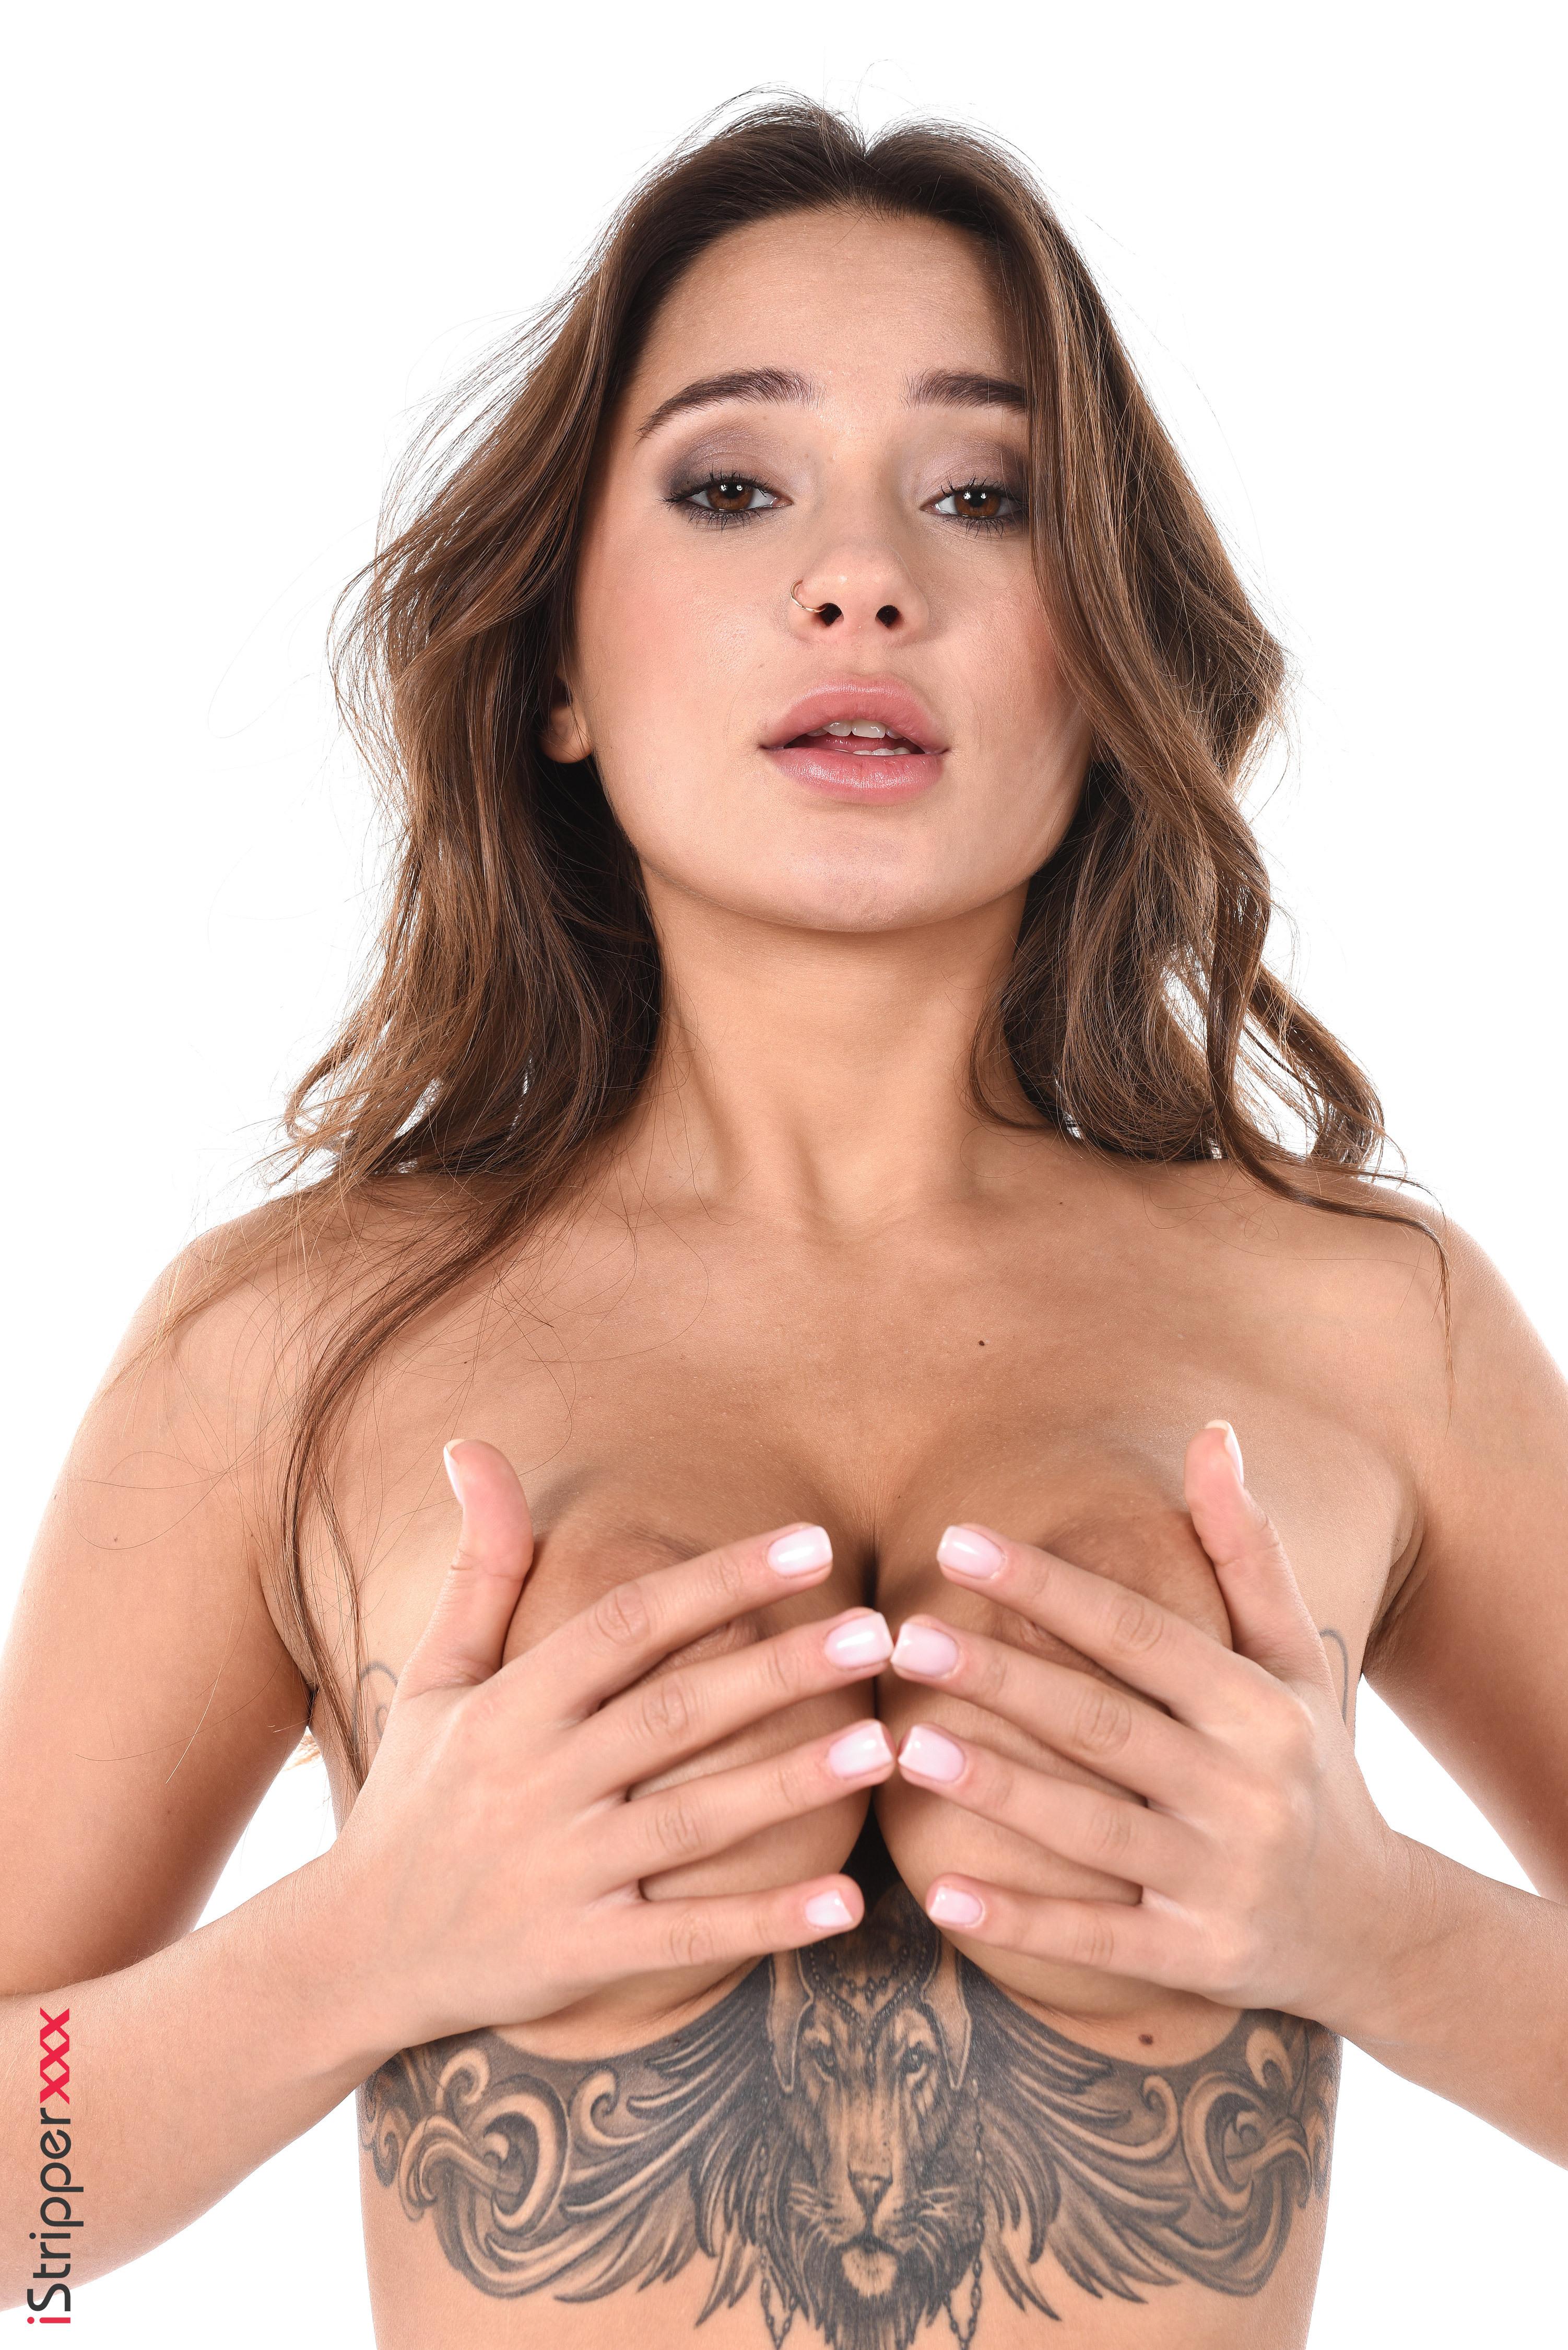 samantha saint sexy jerk off encouragement striptease nude pornhub